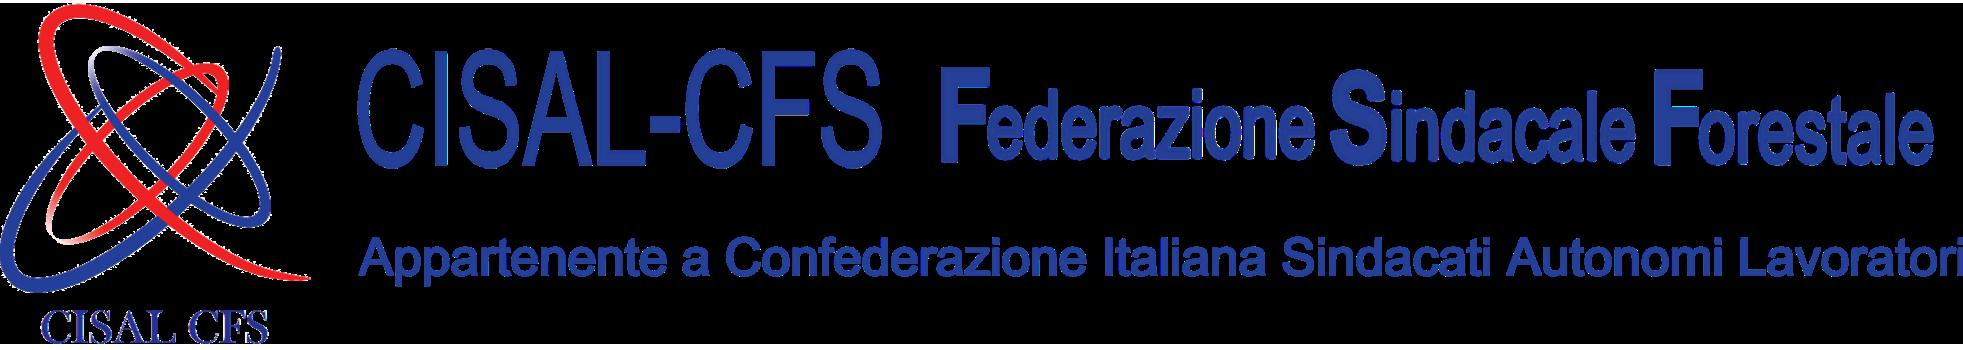 CISAL-CFS